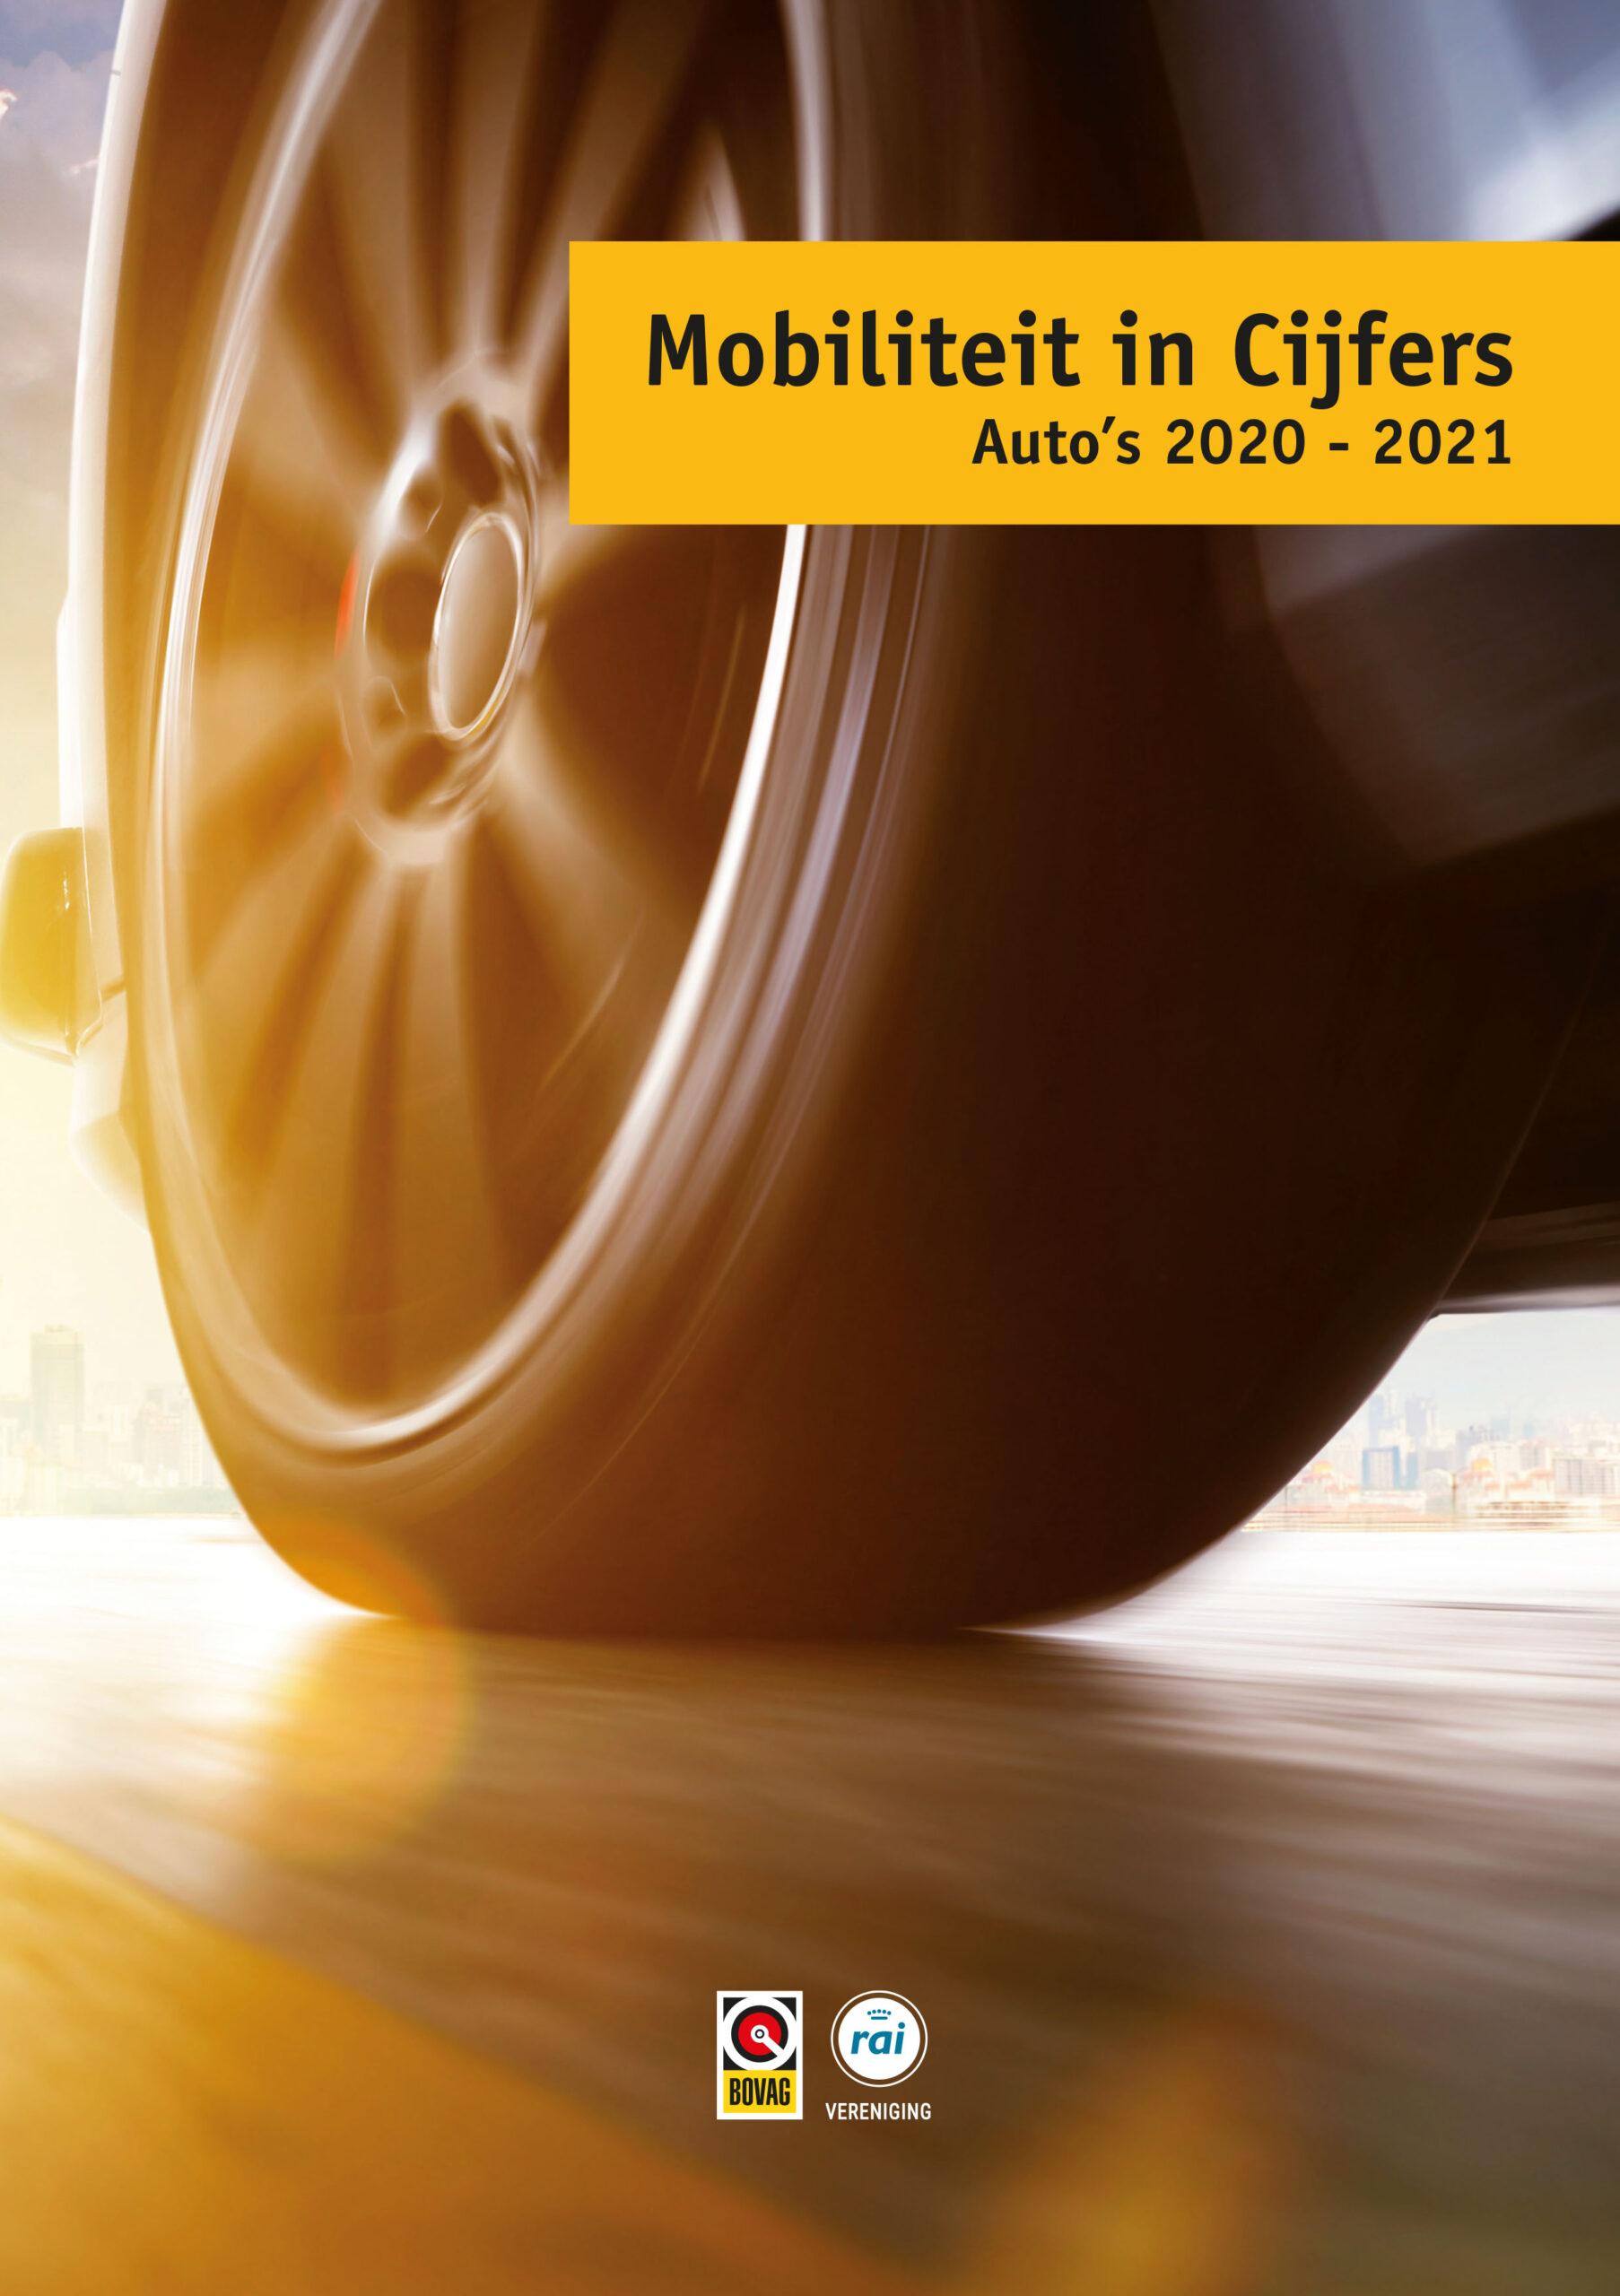 BOVAG-RAI: Mobiliteit in Cijfers Auto 2020 - 2021